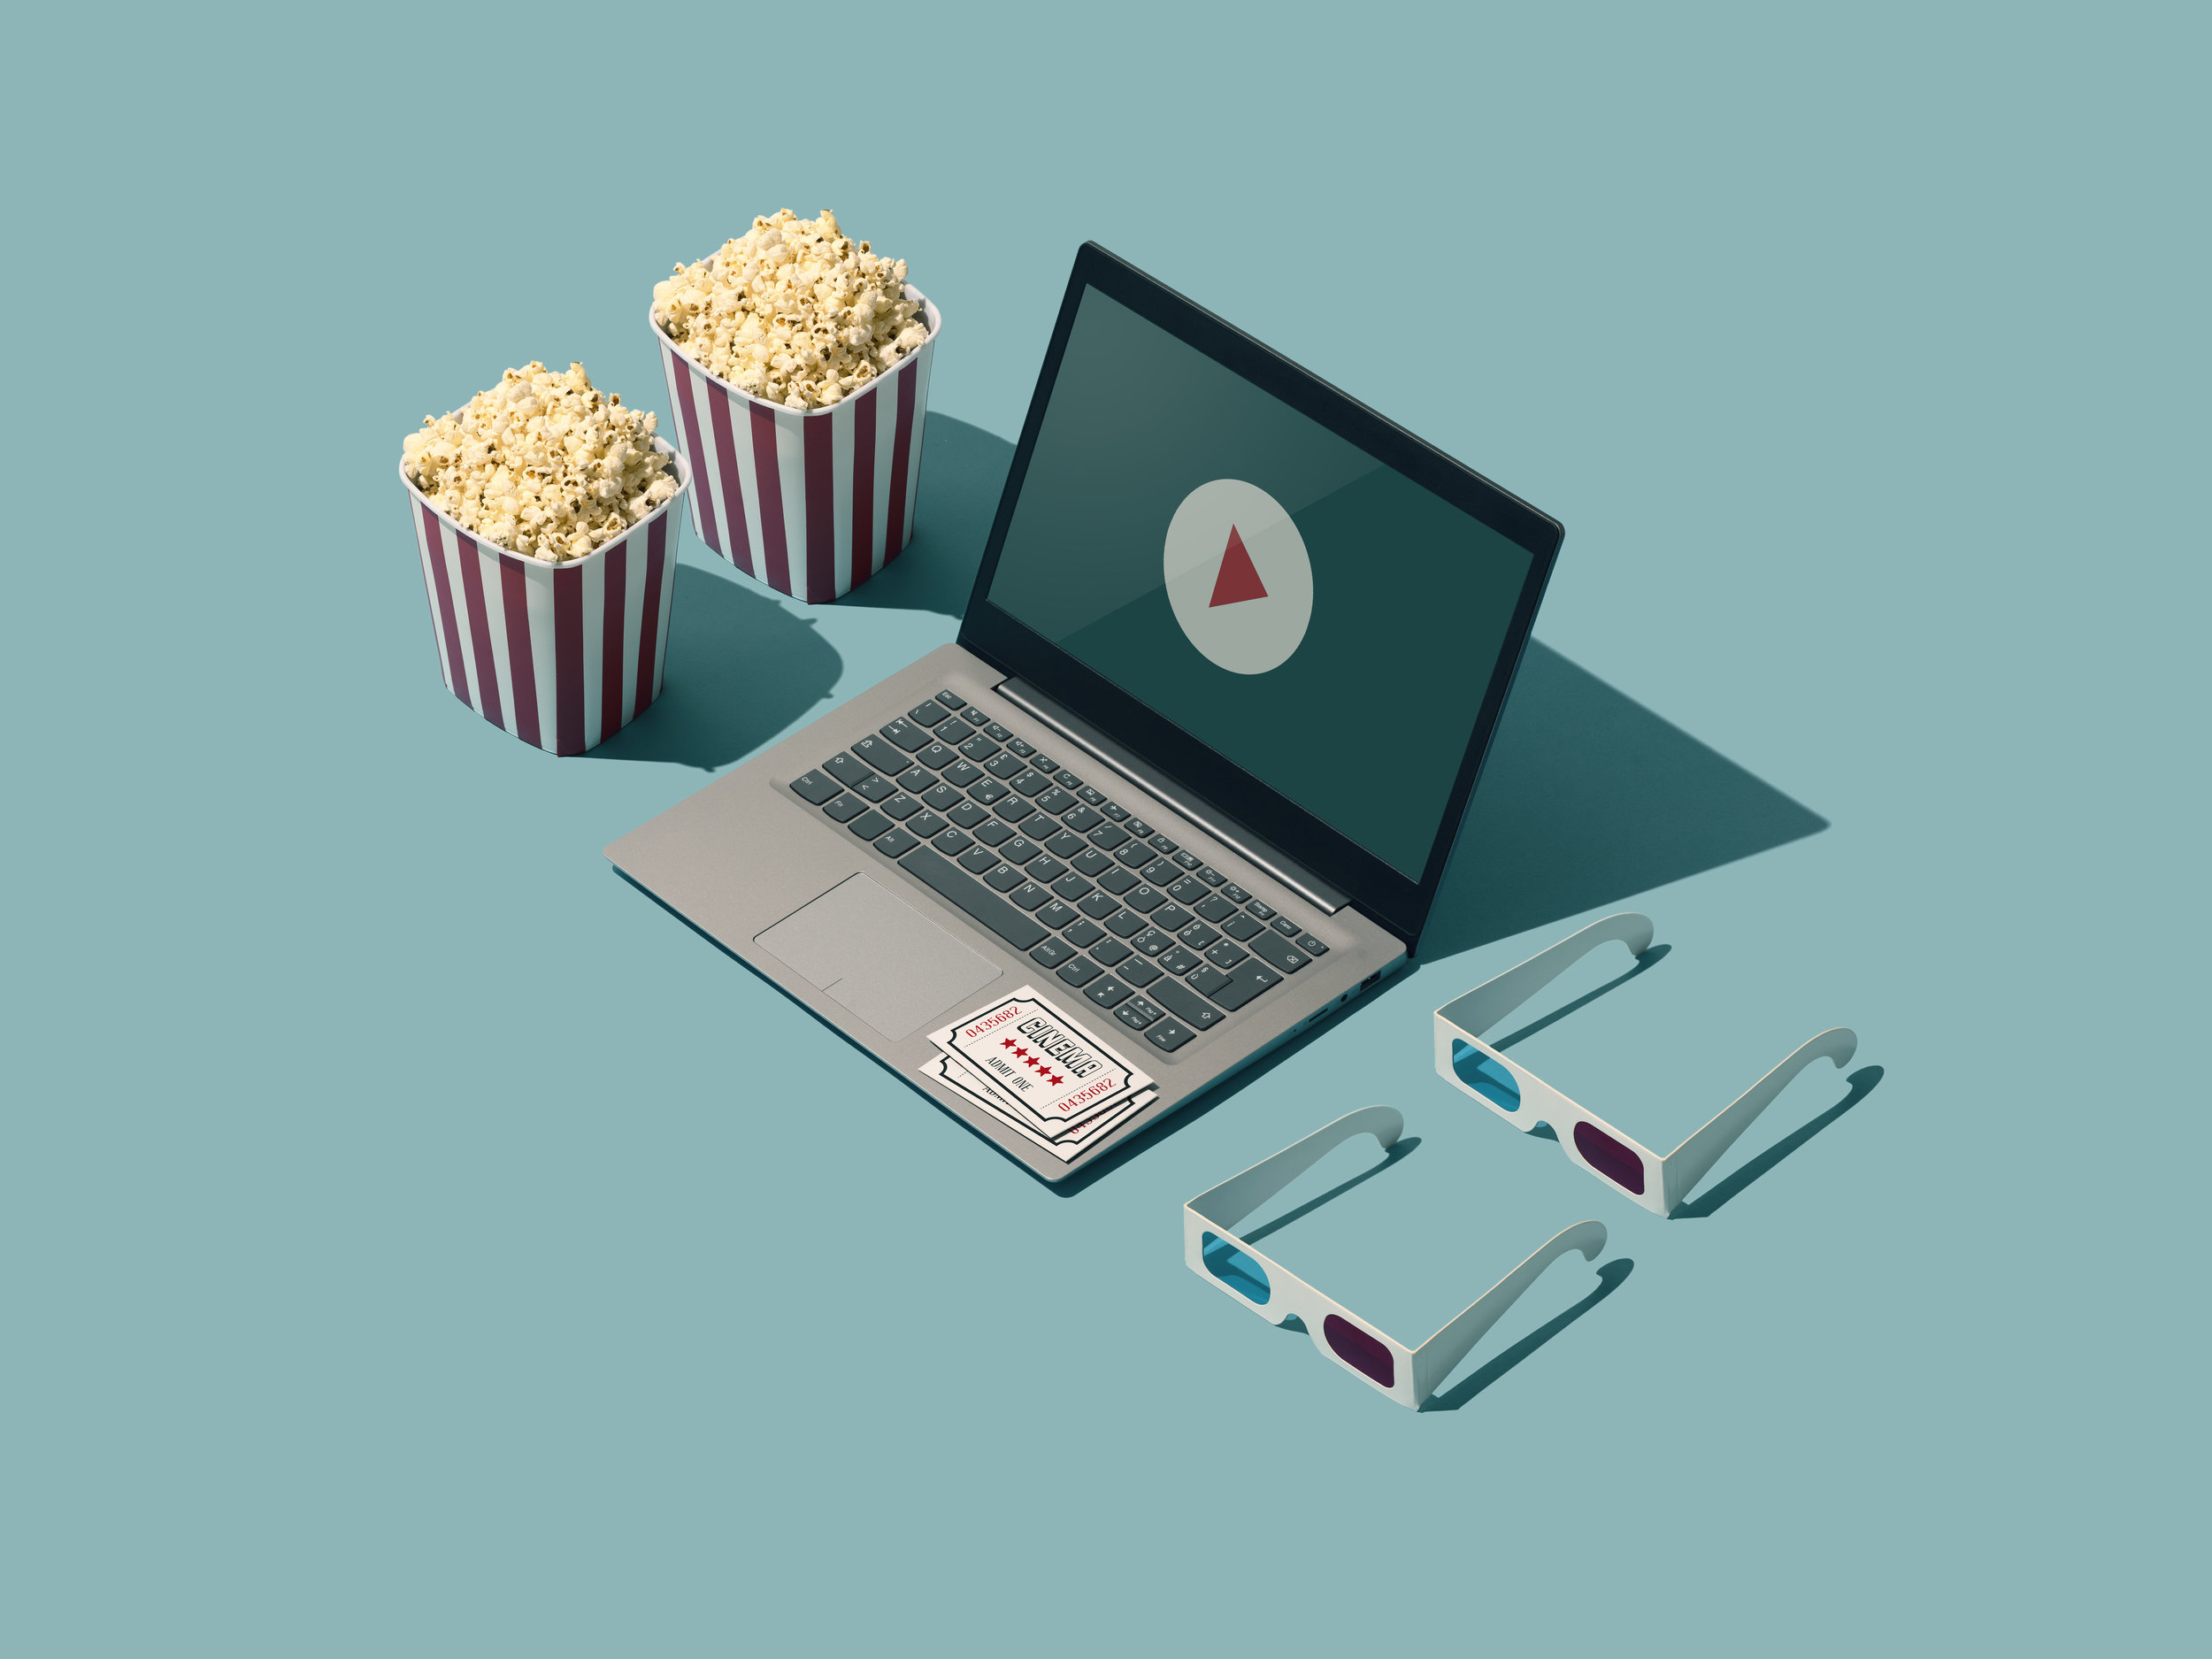 online-movie-streaming-and-cinema-S6CVFWB.jpg